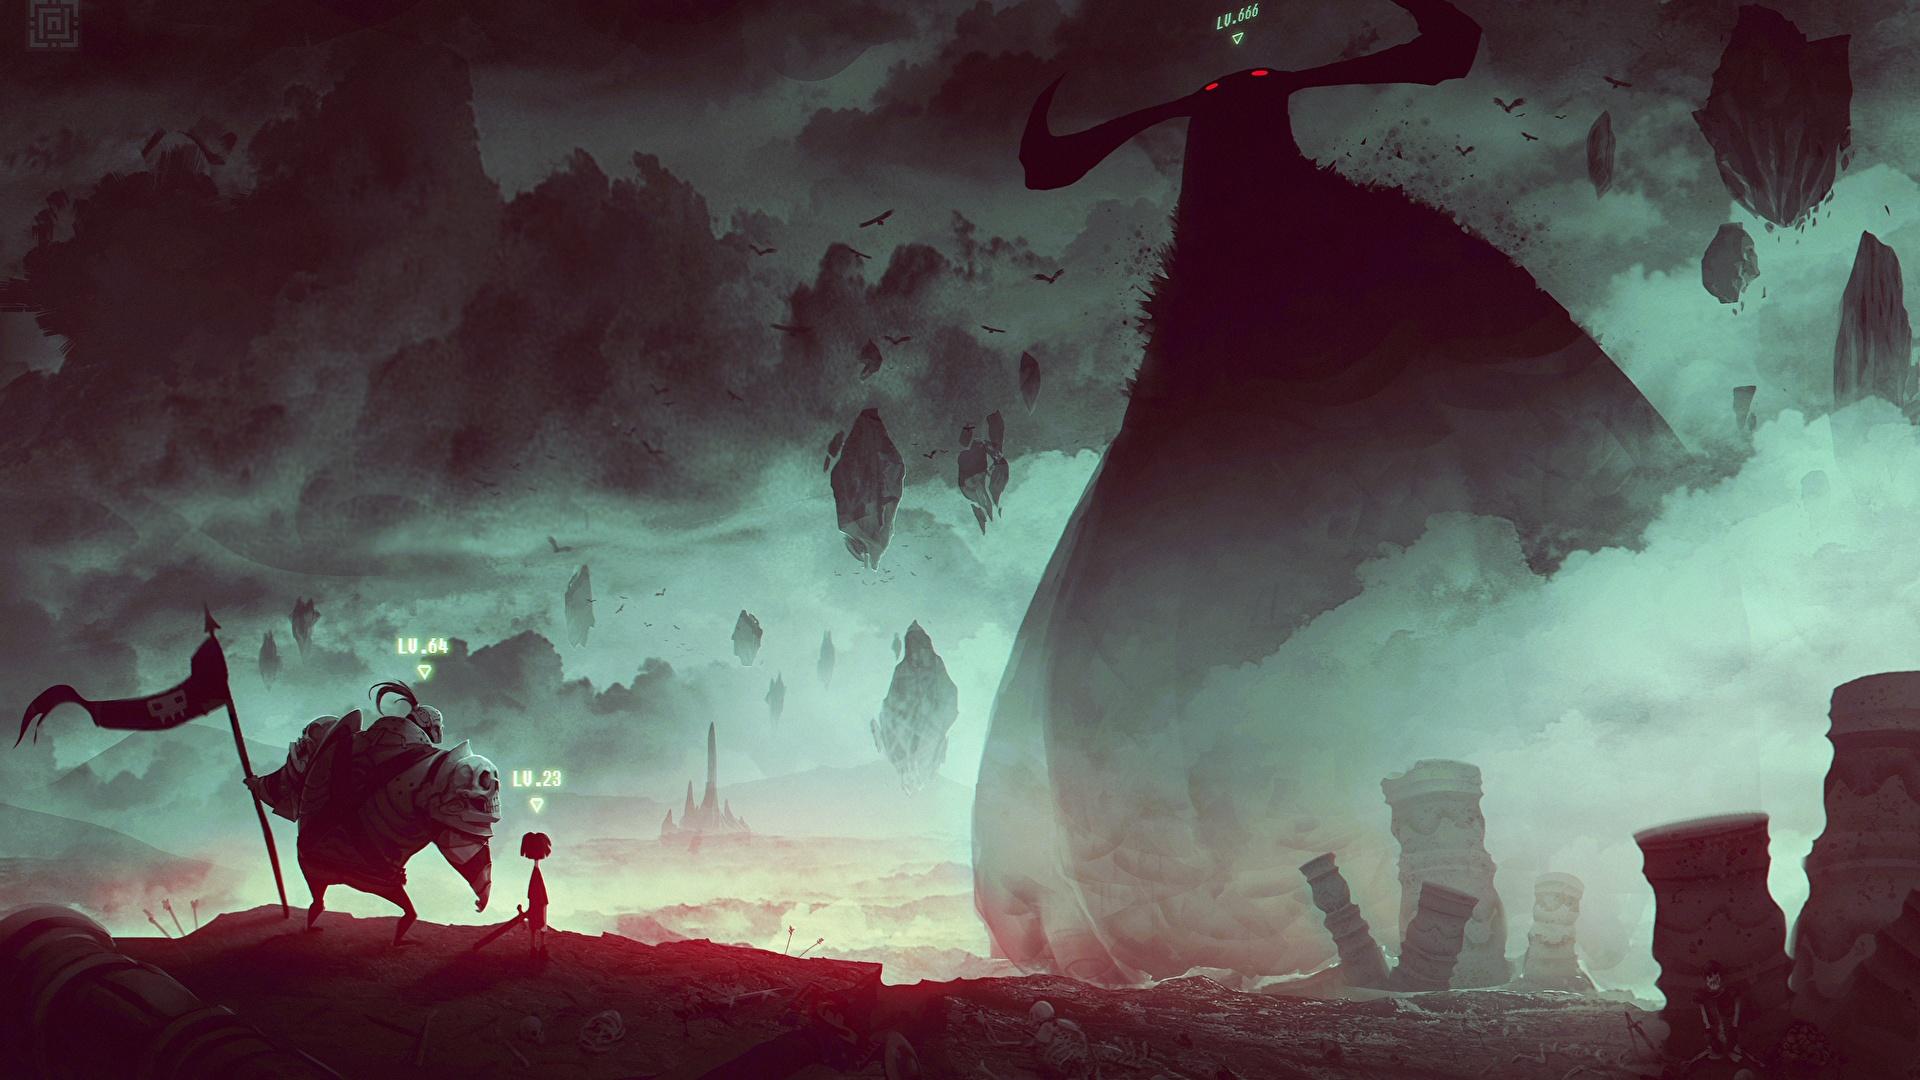 Картинка Монстры воин Фантастика Фантастический мир 1920x1080 монстр чудовище воины Воители Фэнтези